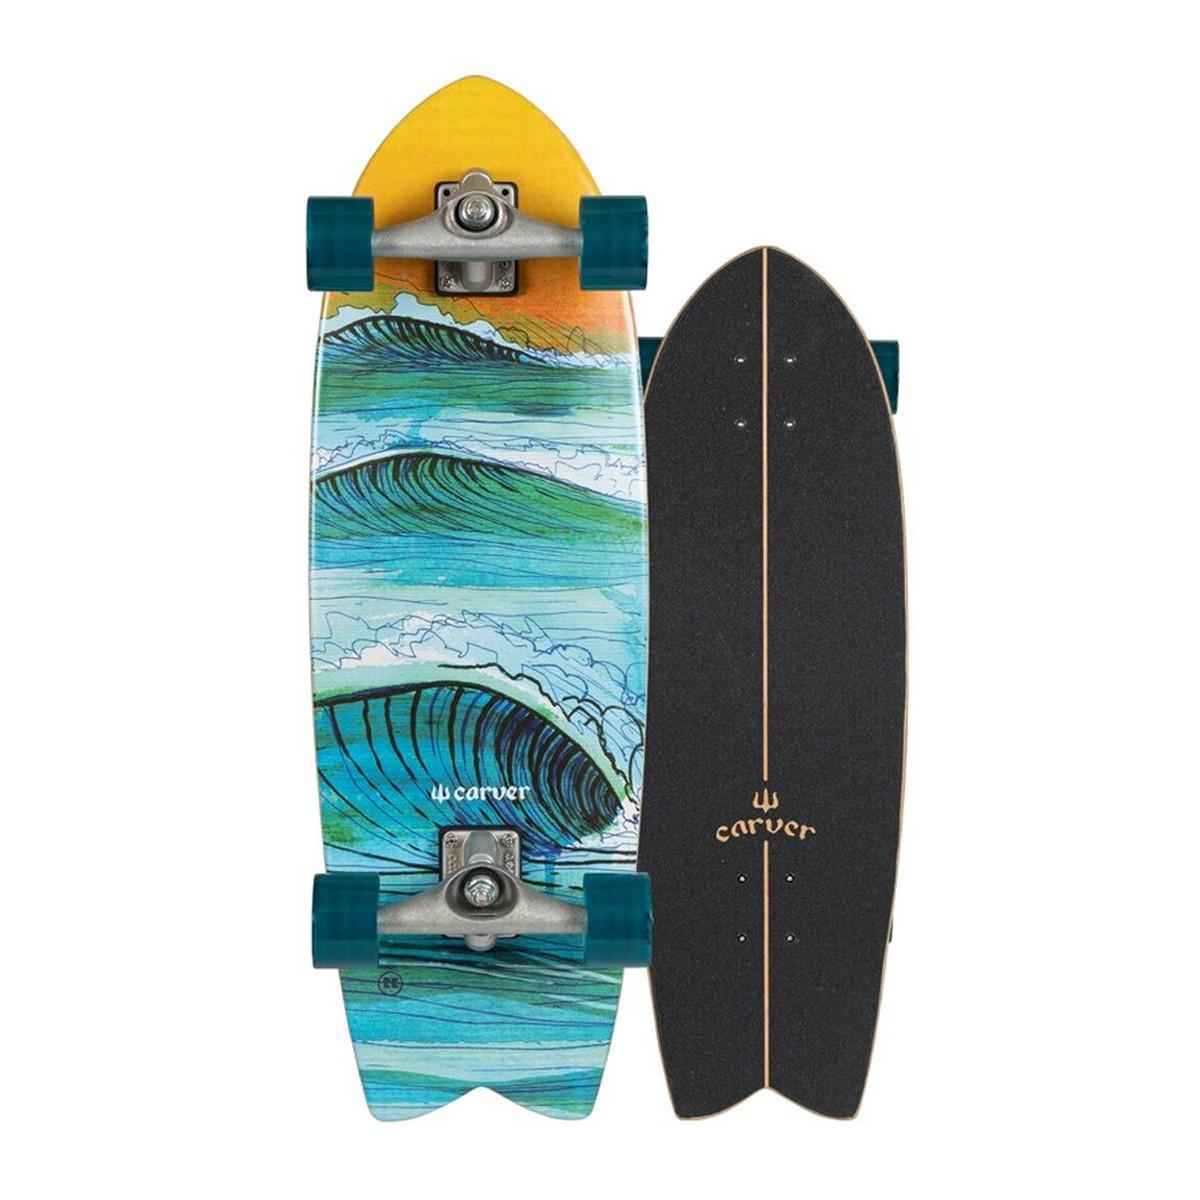 Carver Swallow 29.5'' Surfskates CX Cruiser C1012011104